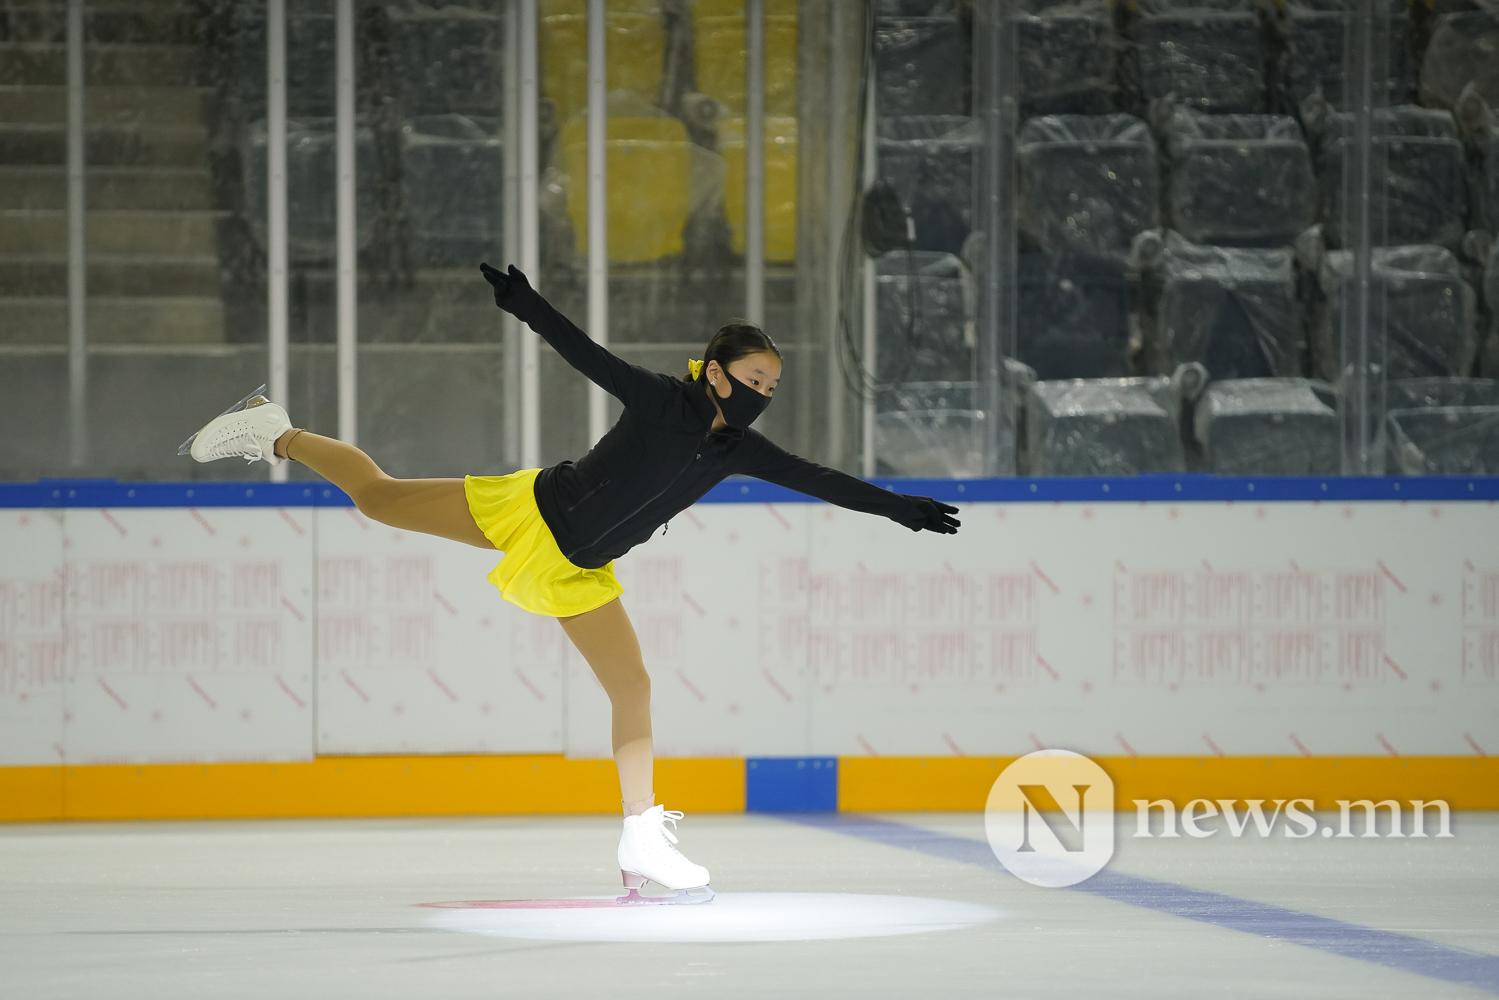 Steppe Arena Мөсөн ордон (4 of 24)